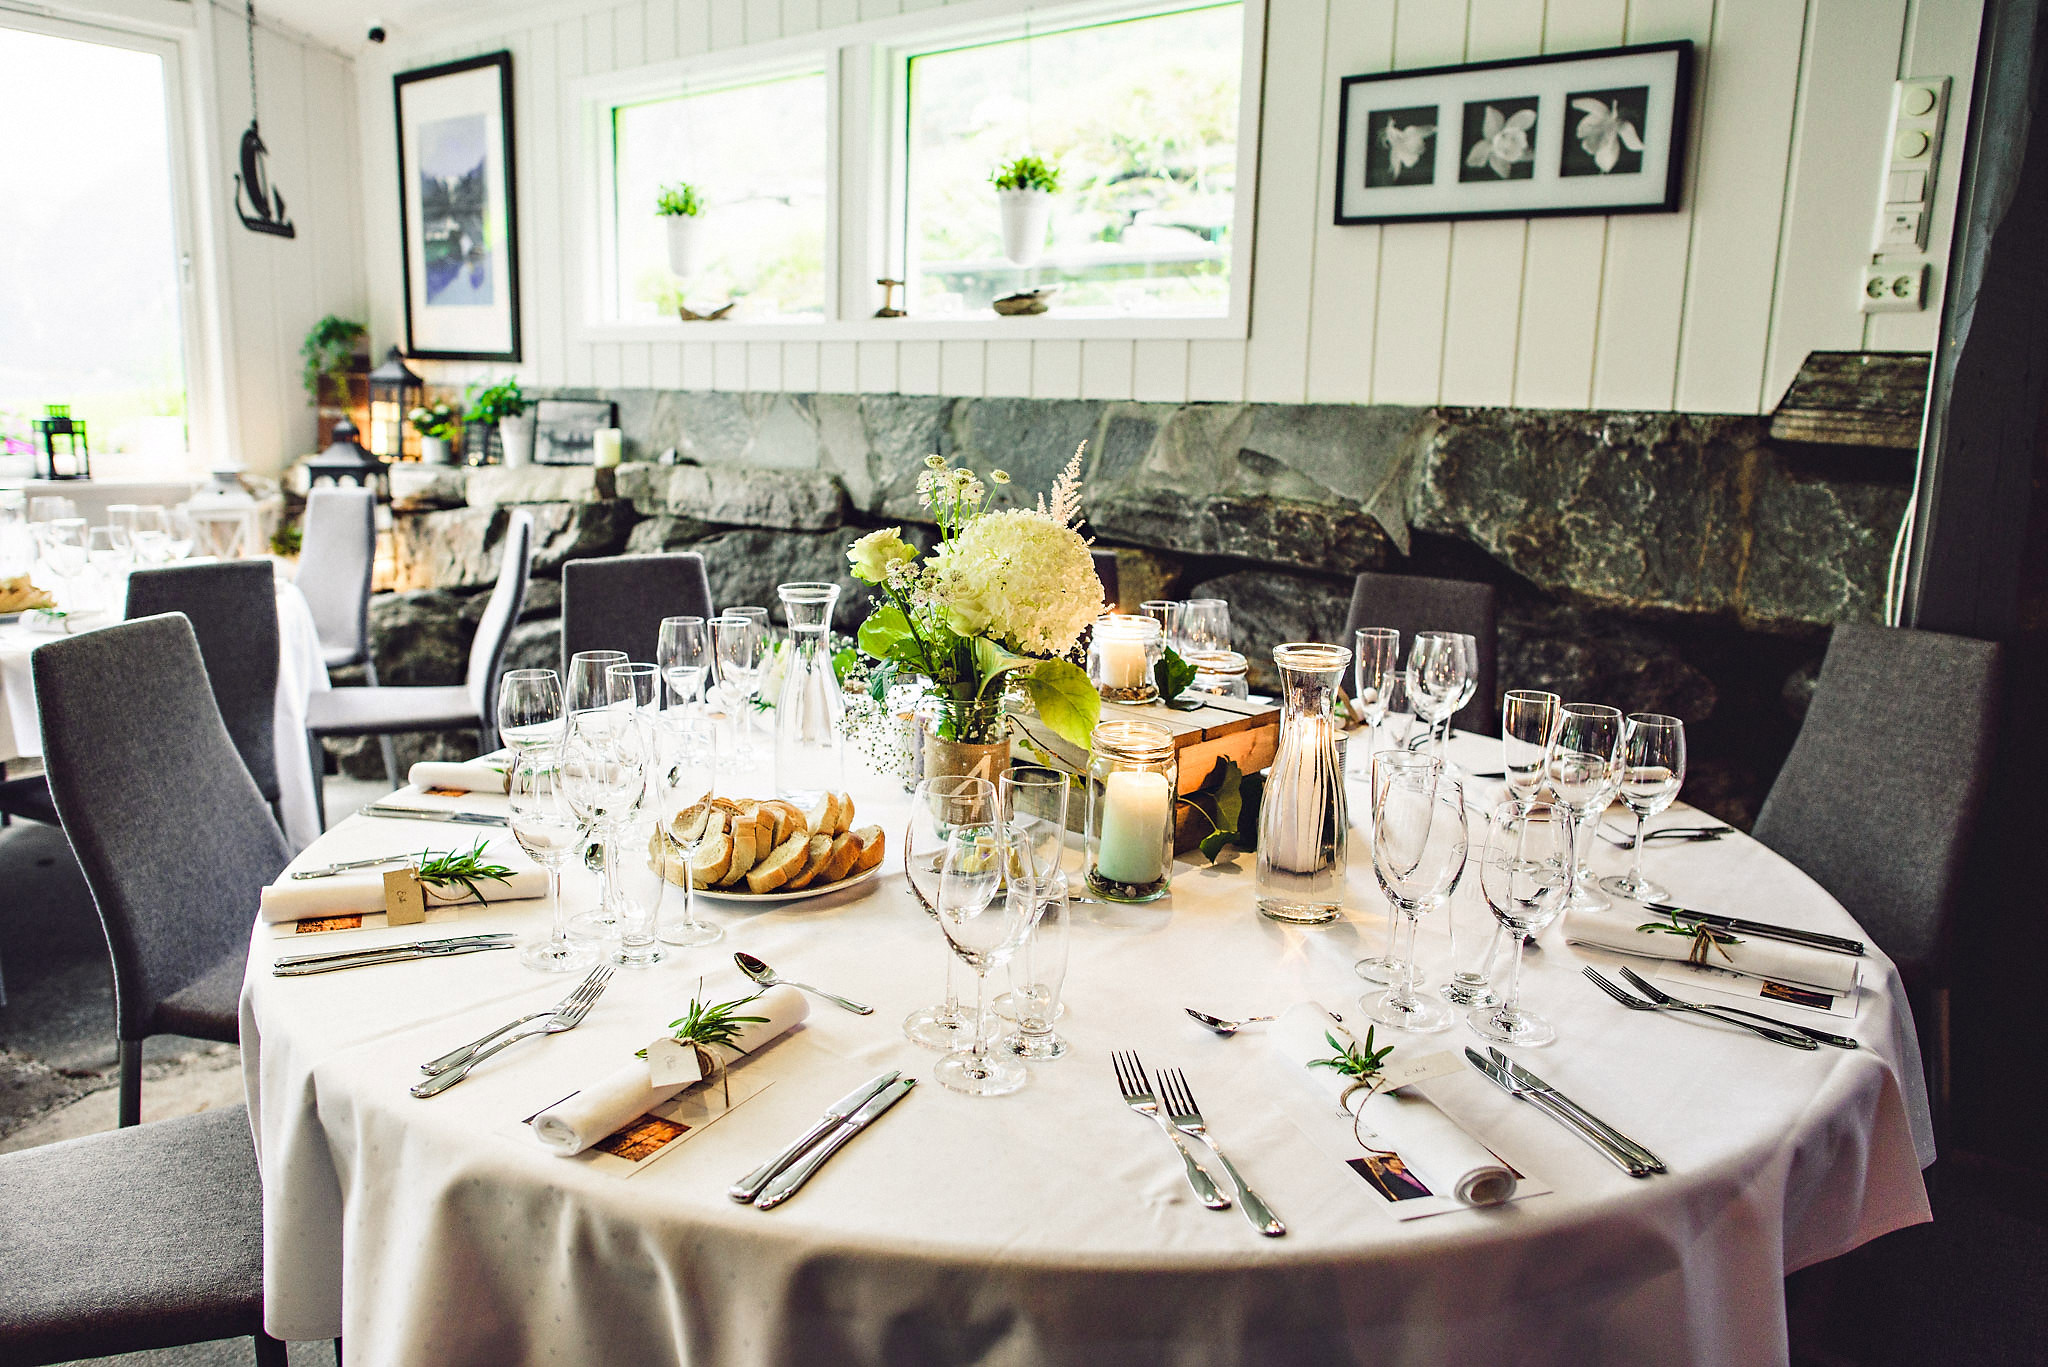 Bryllup på Yrineset i Oldedalen bryllupsfotograf sogn og fjordane-22.jpg